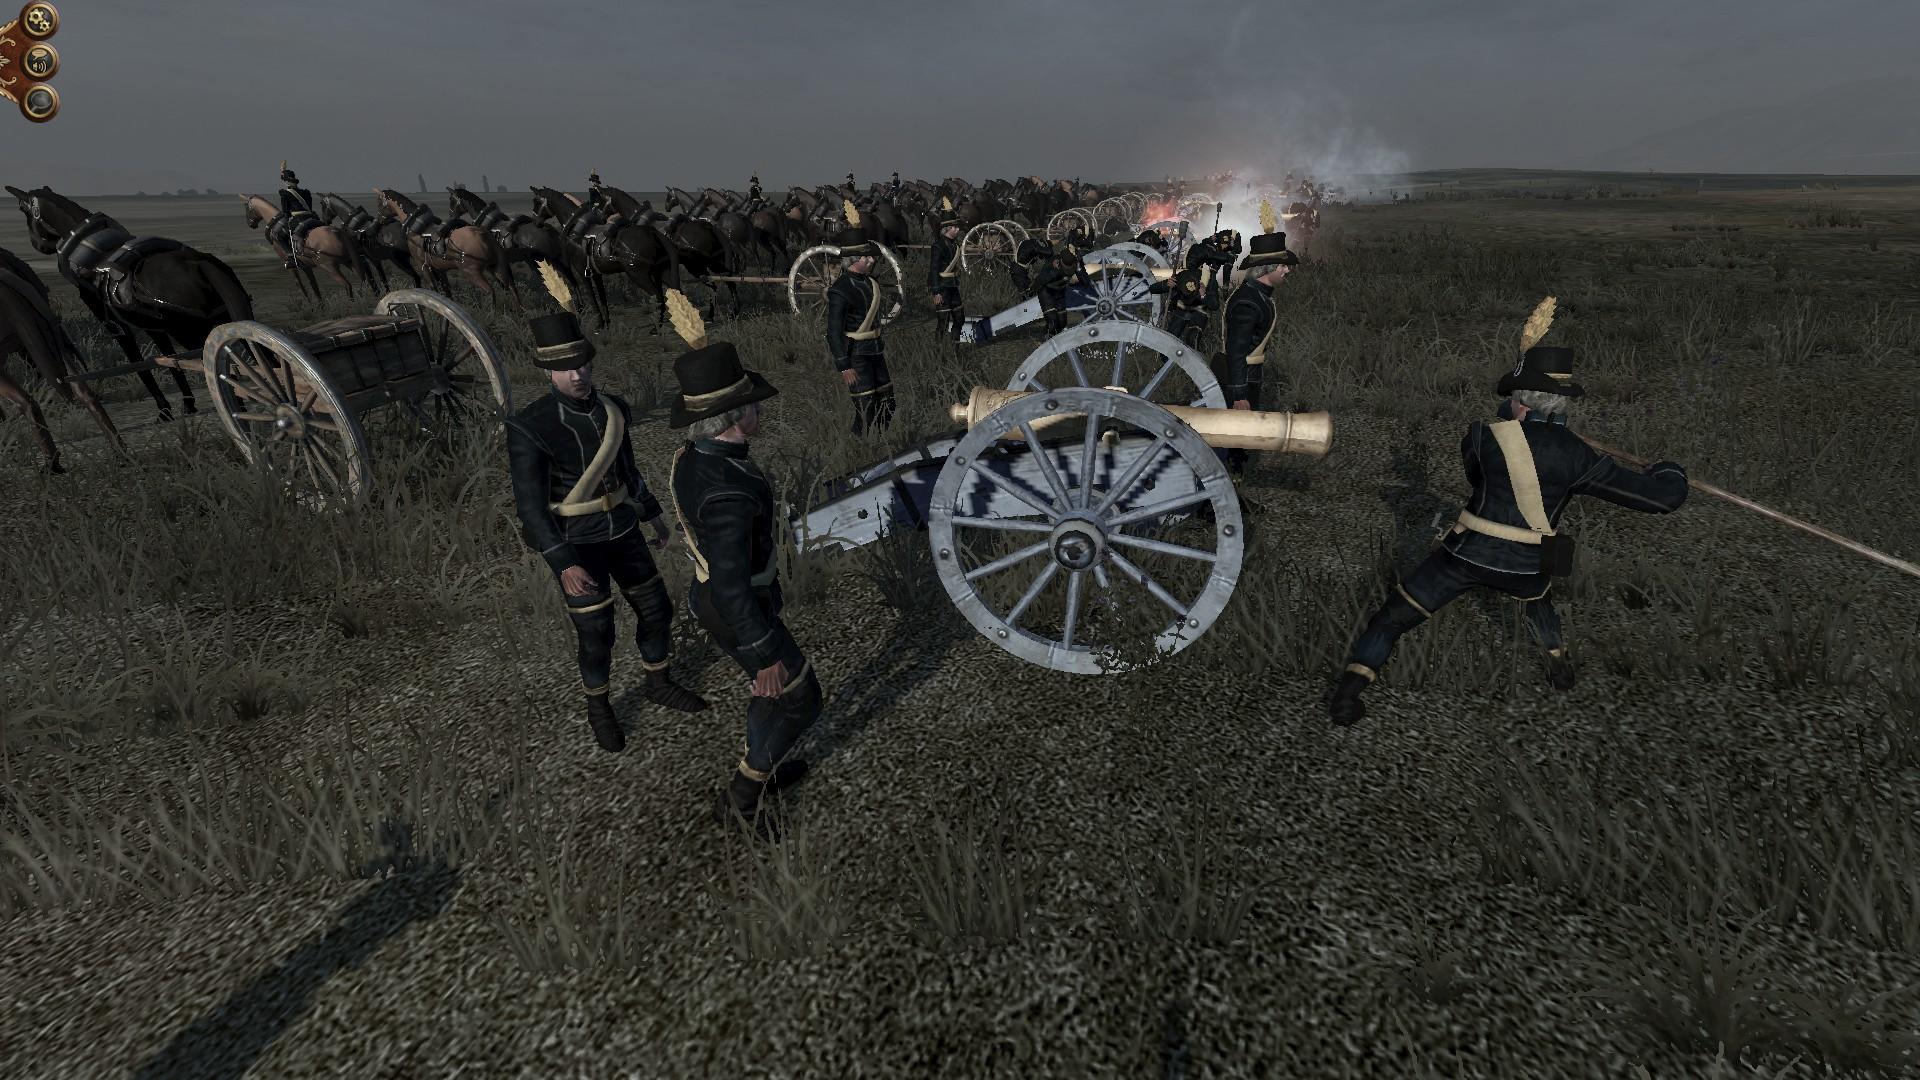 Artillery